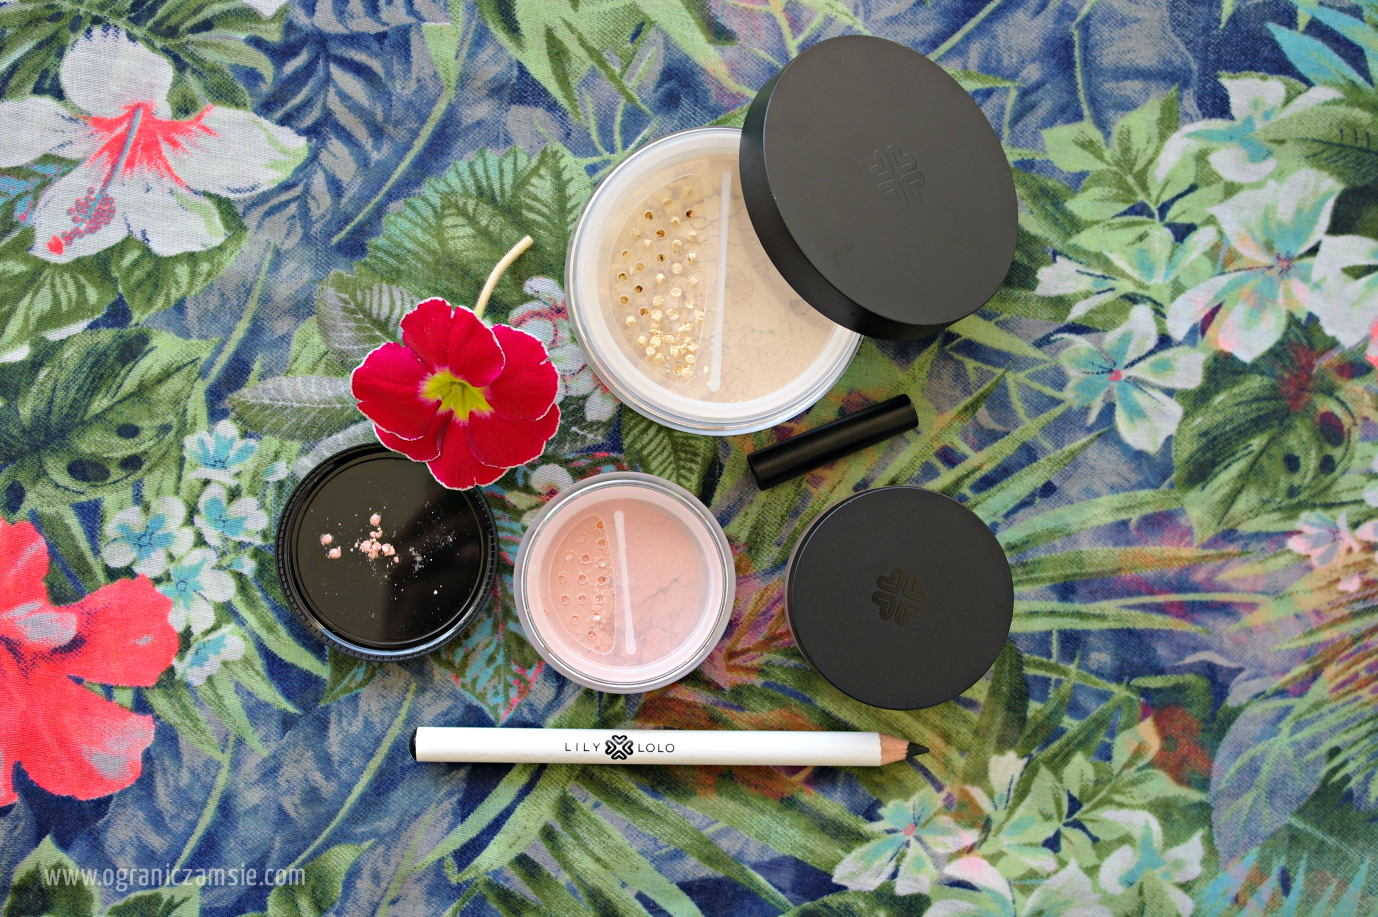 kosmetyki weganskie puder kredka mineralne minimalizm